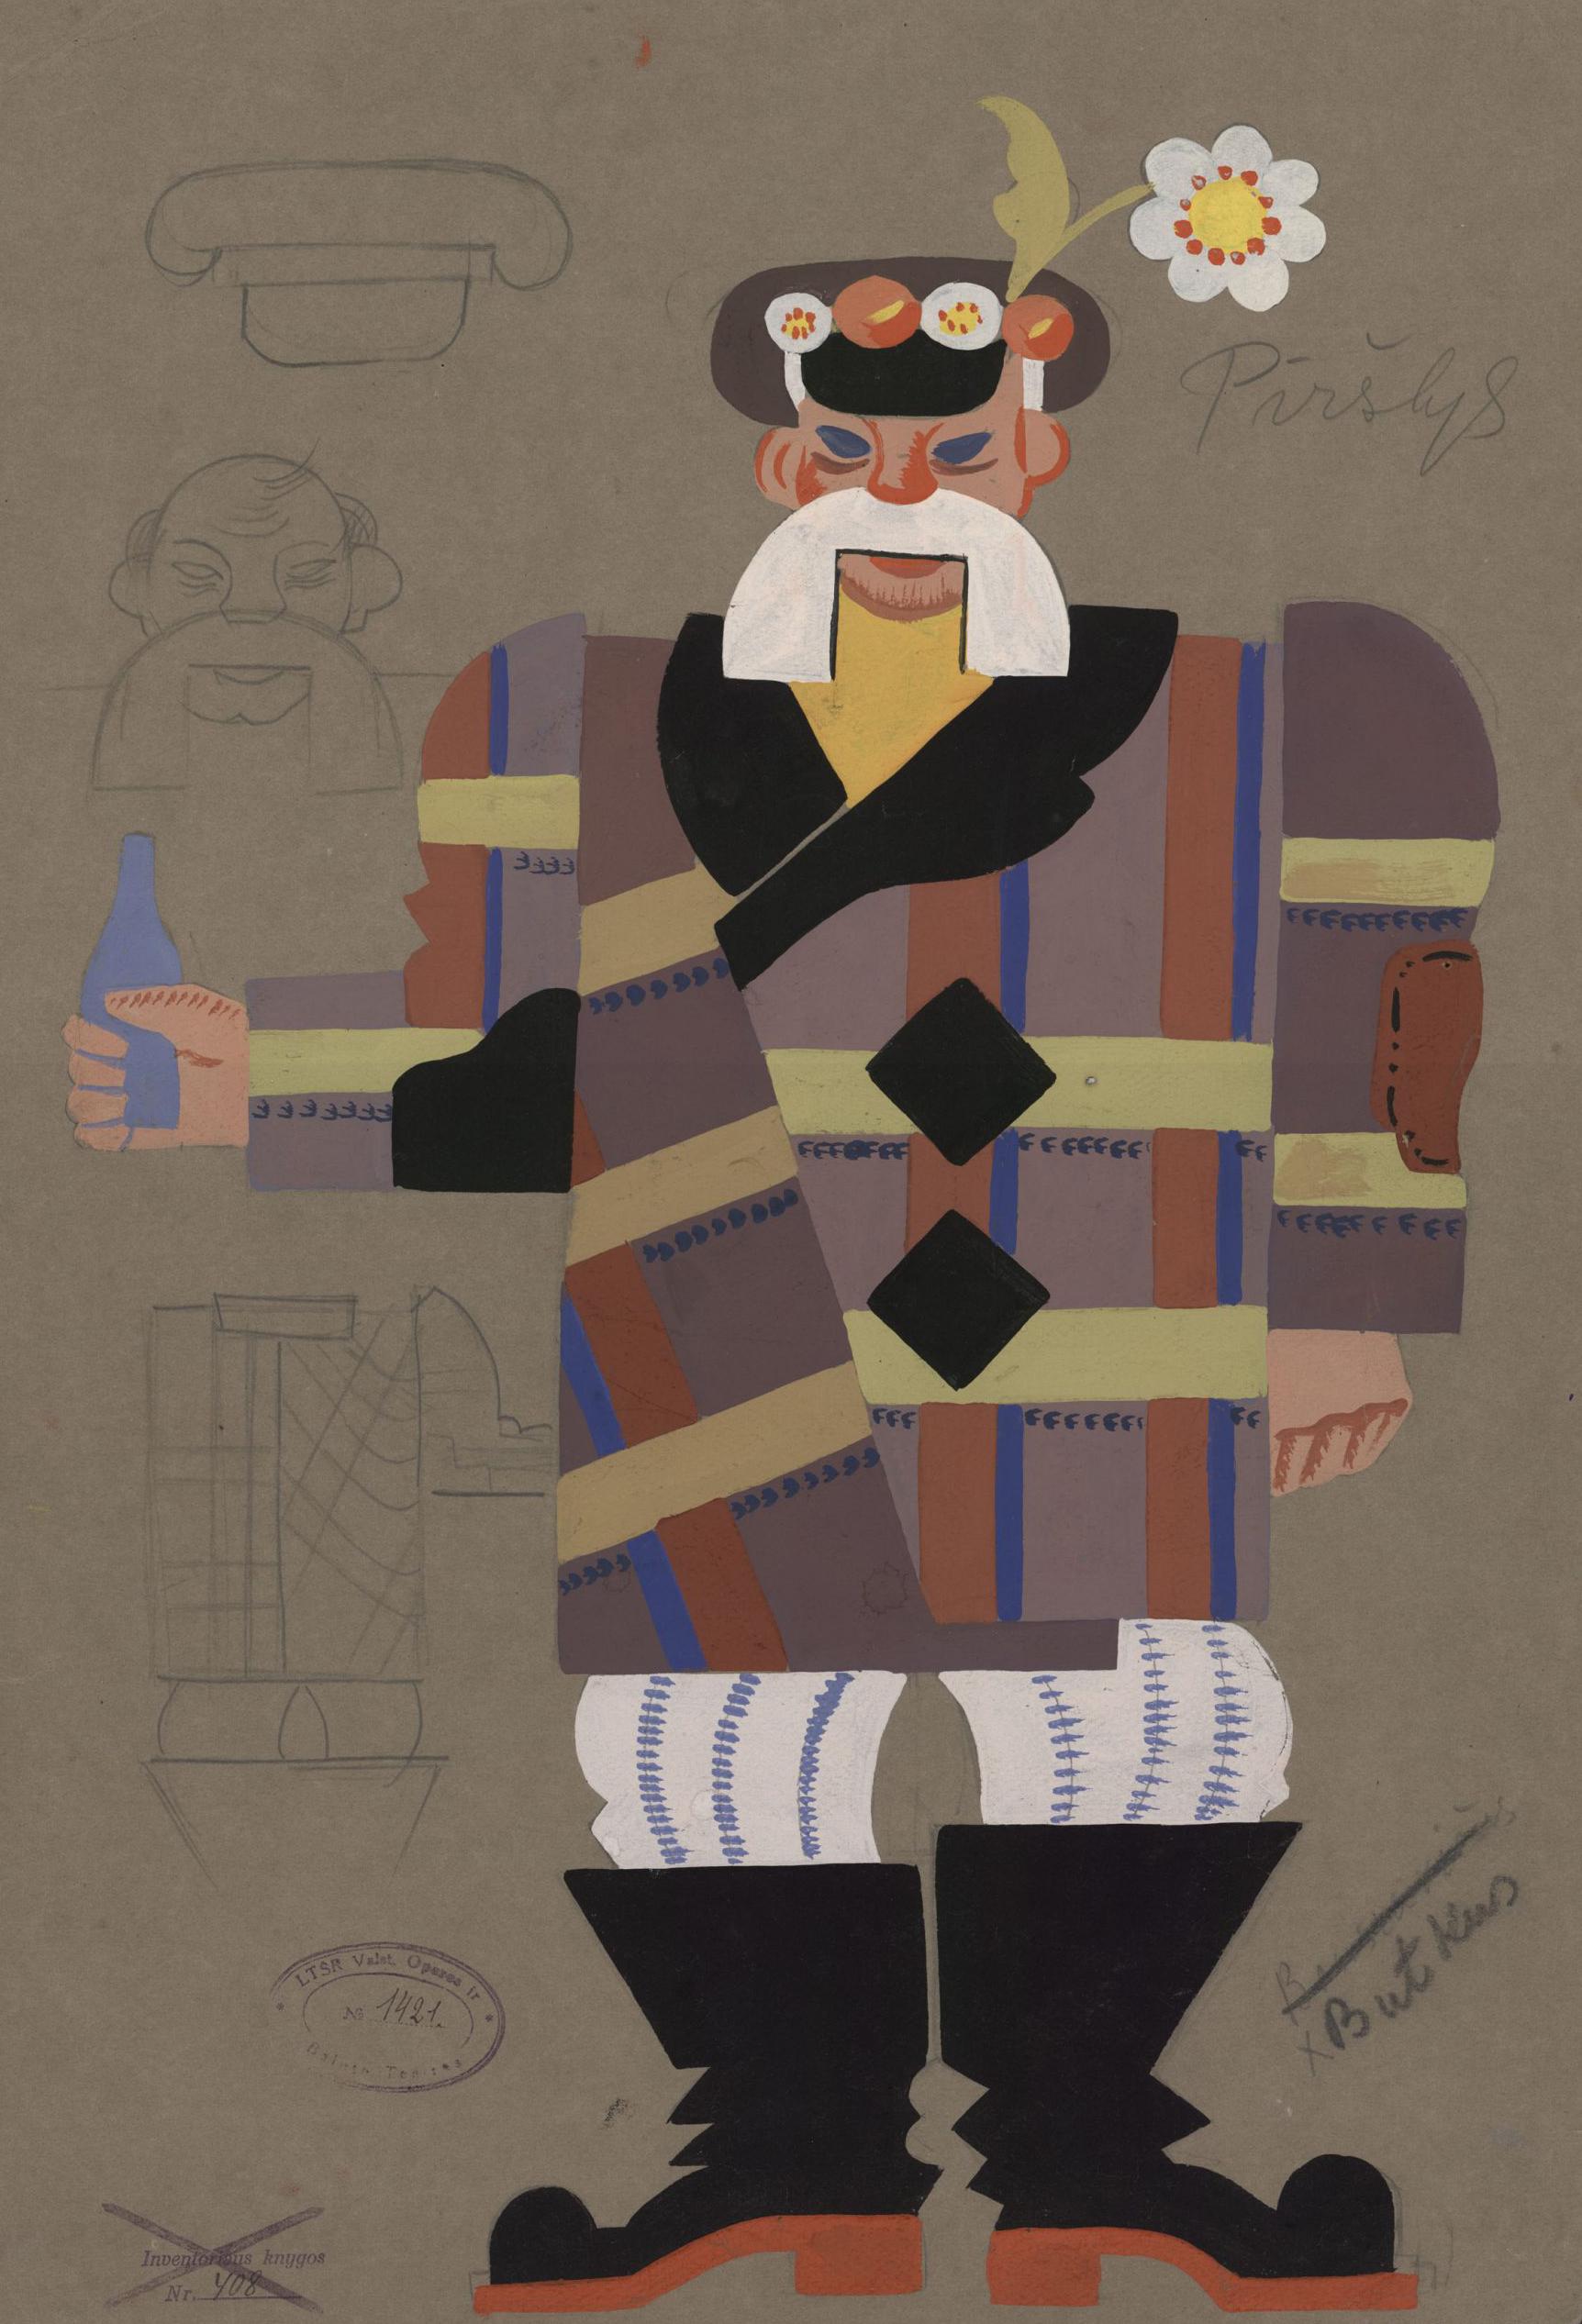 Stasys Ušinskas, Valstybės teatras, kostiumo eskizas